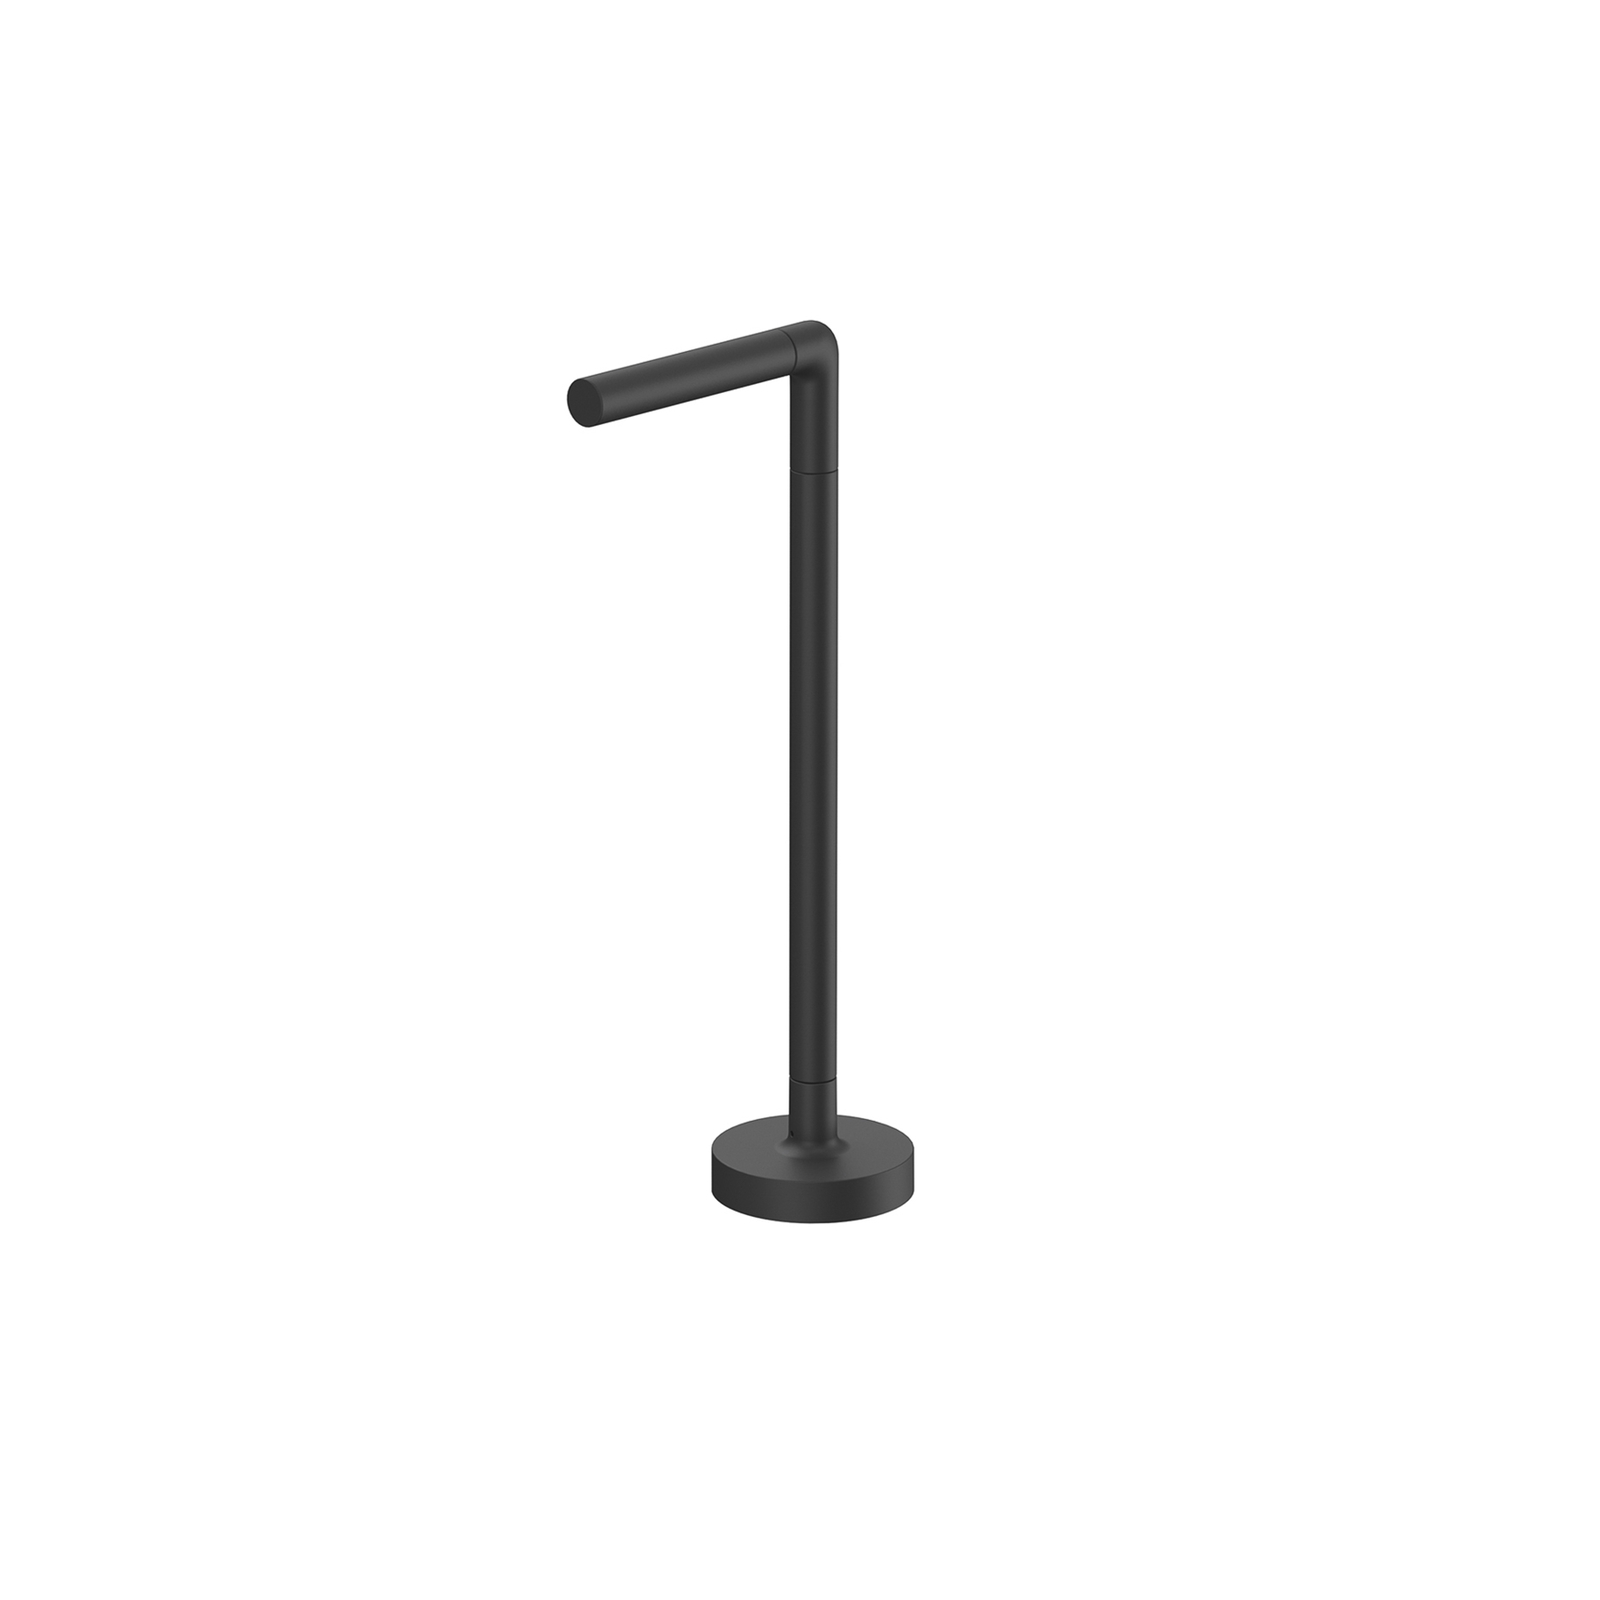 FLOS Walkstick Pipe 1 gånglampa, 2700K, svart